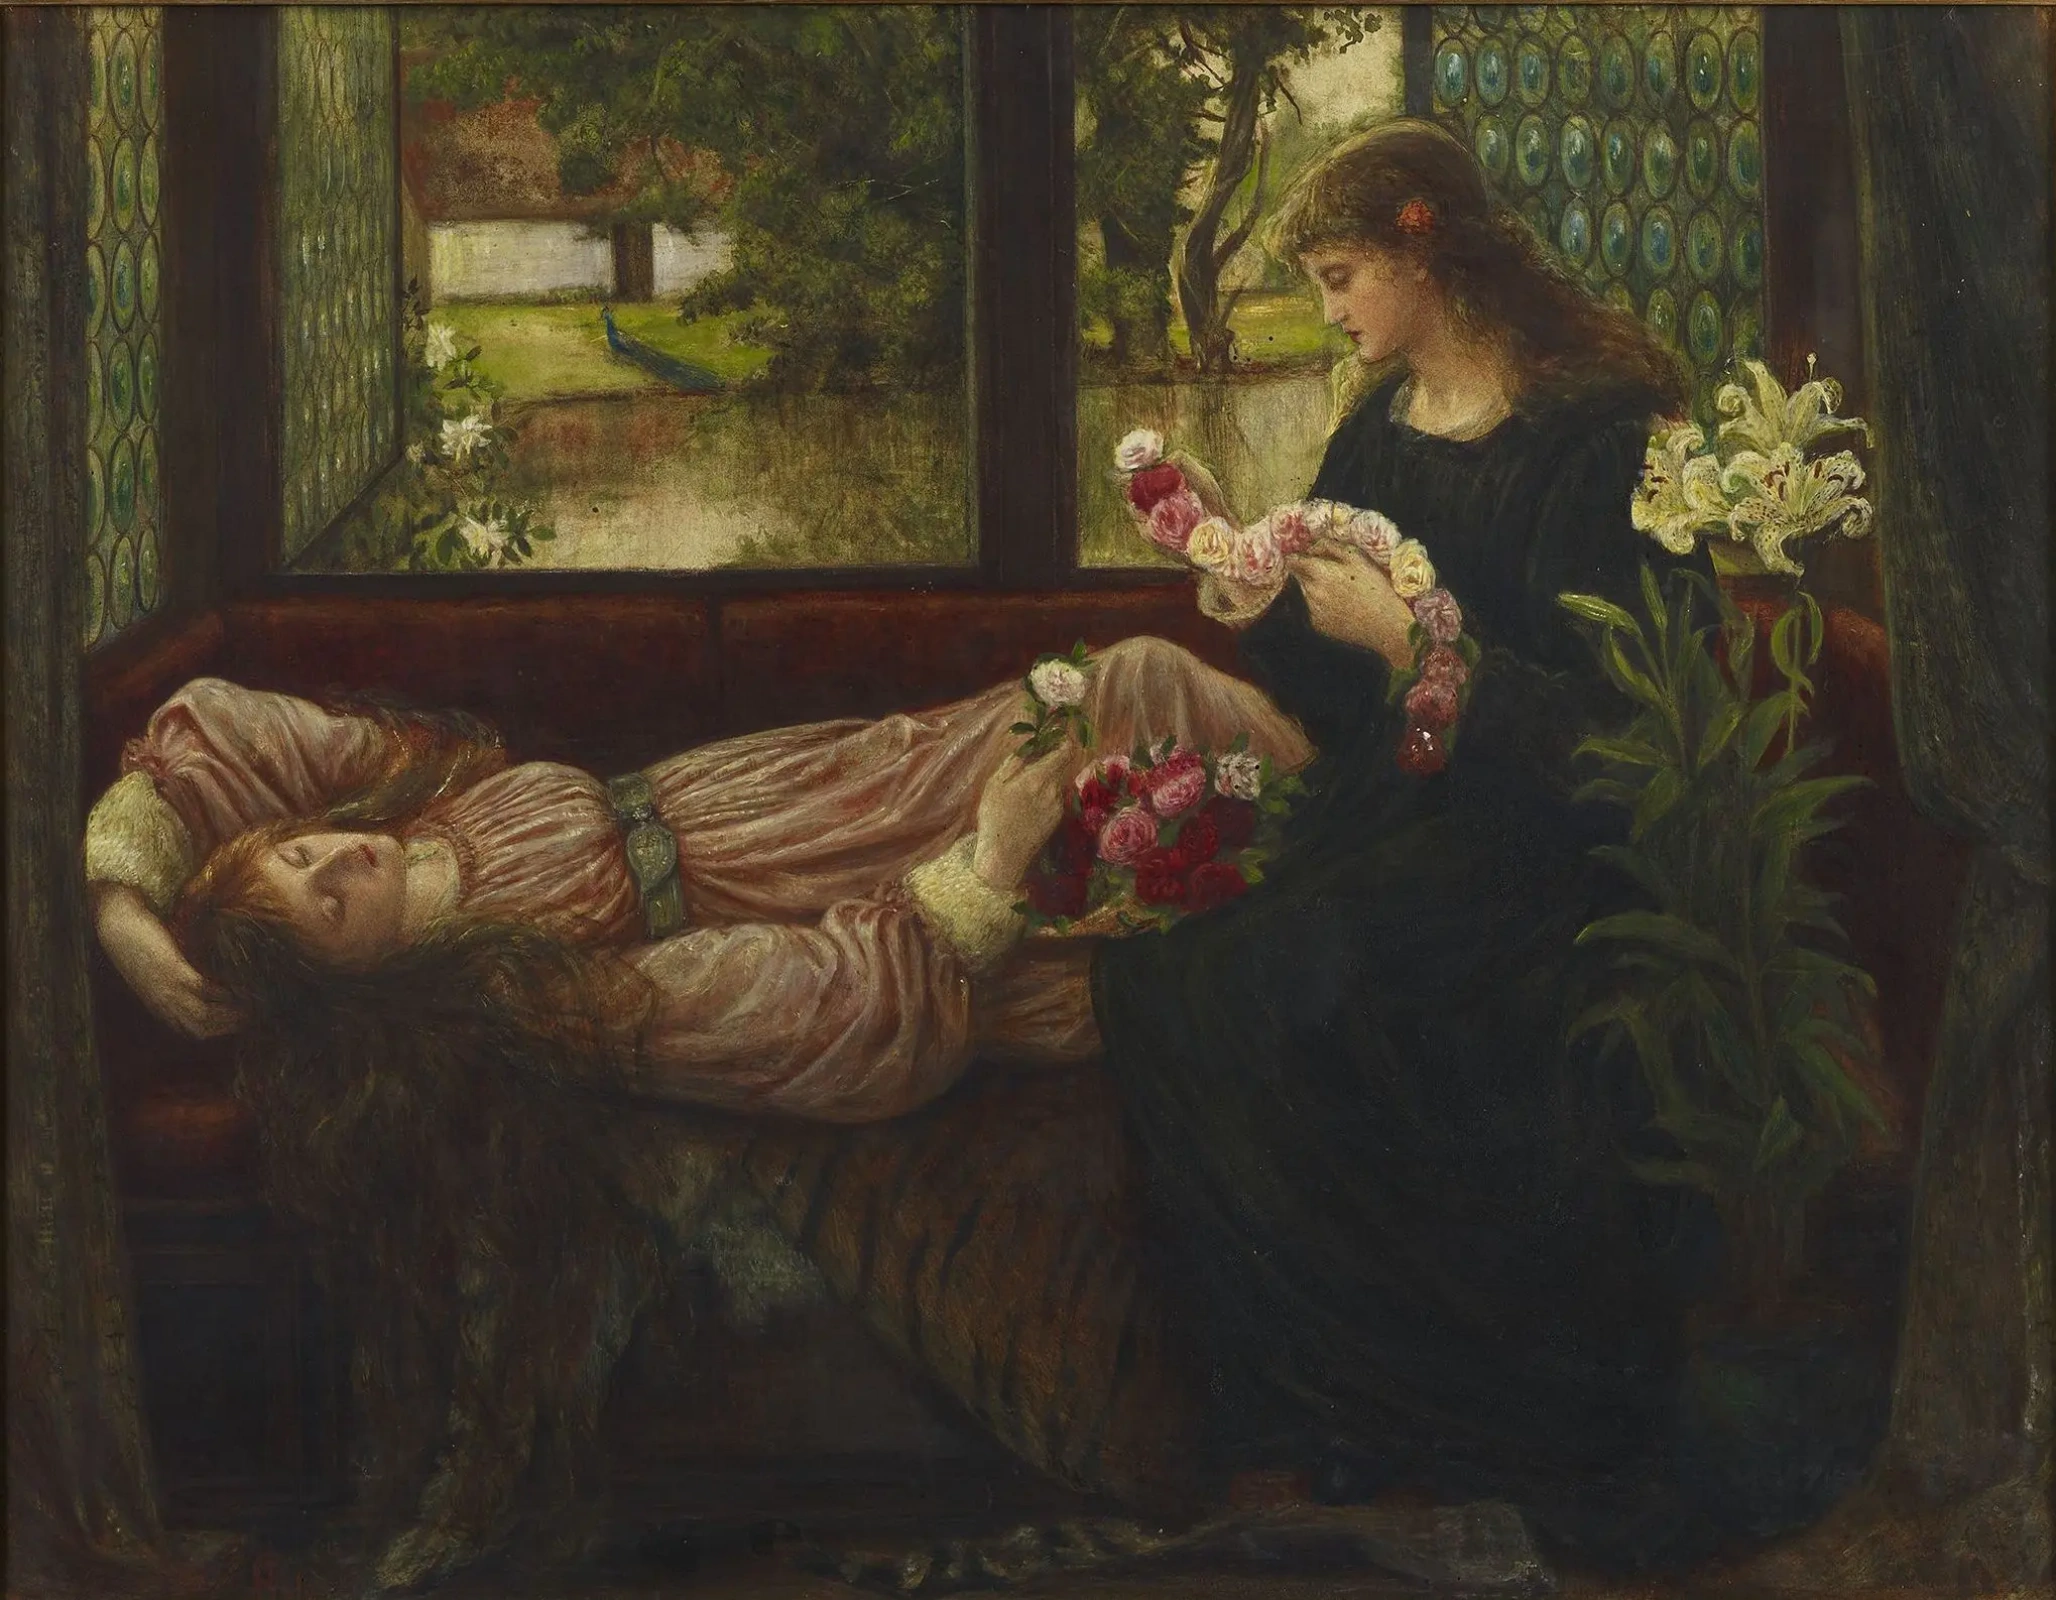 Мария Евфросина Спартали Стиллман «Венок из роз», 1880